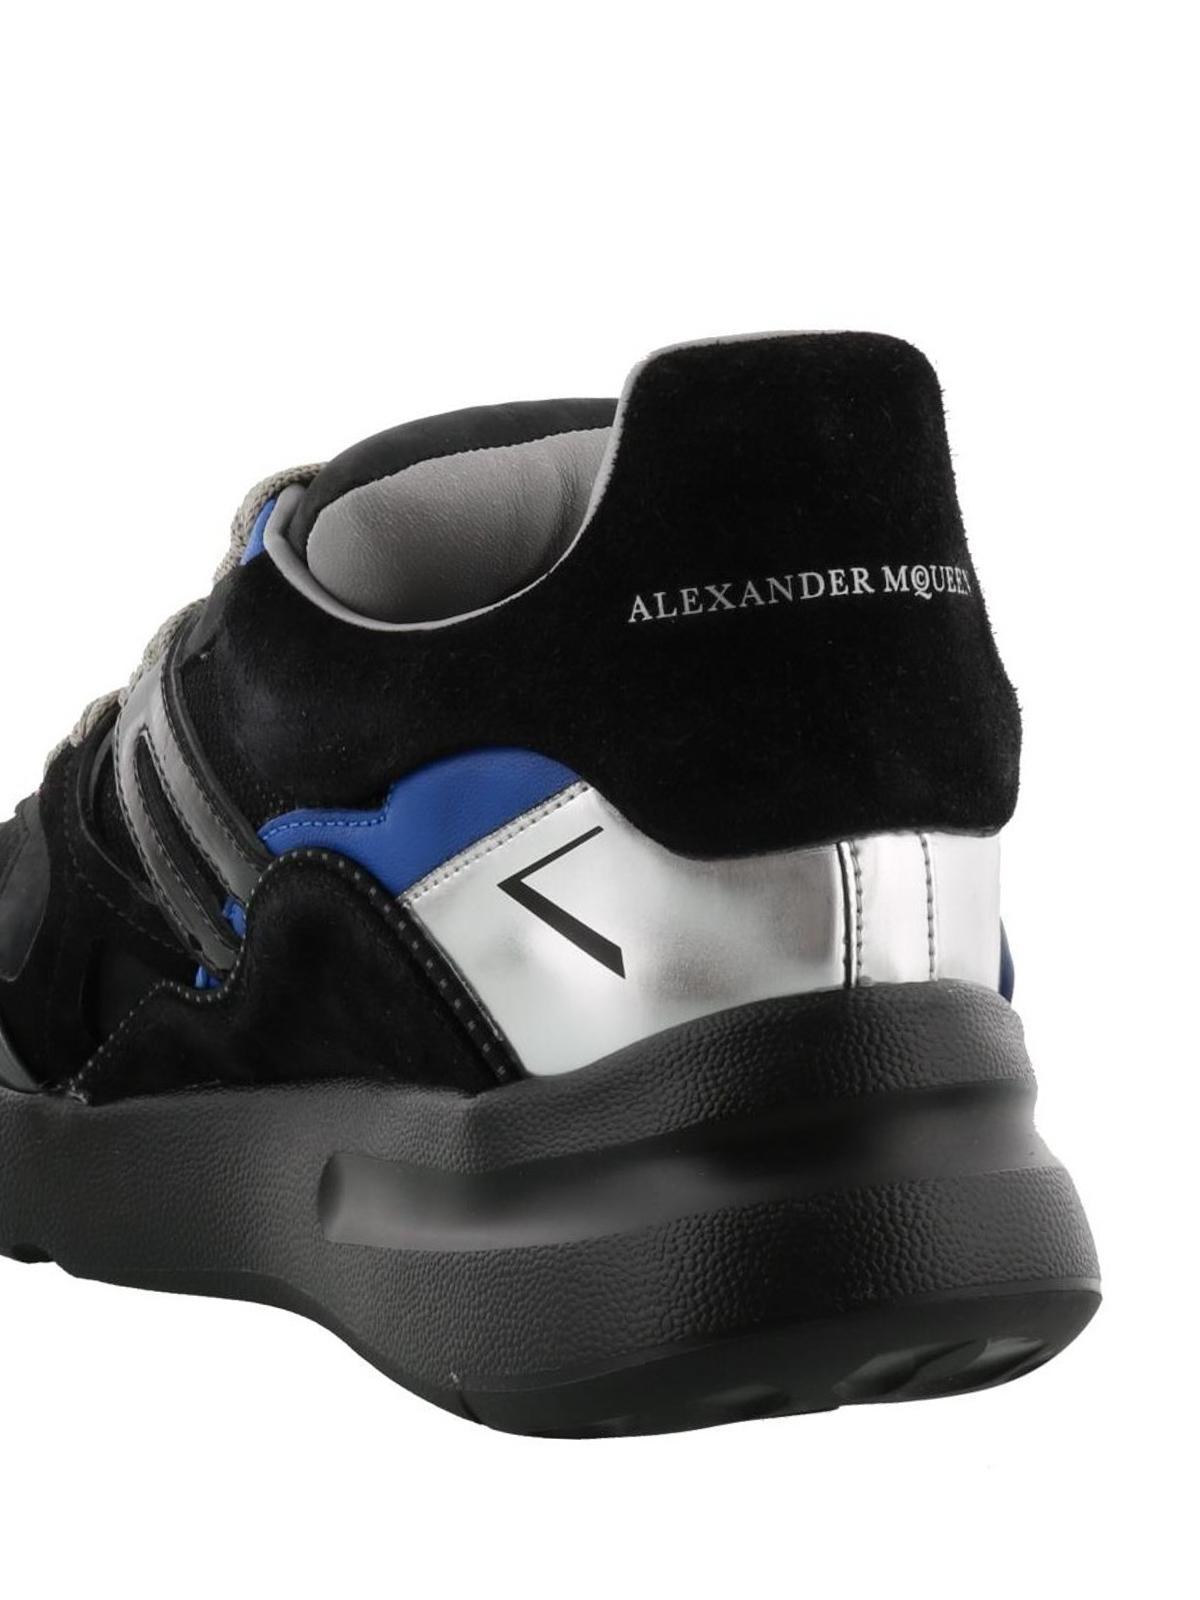 Alexander Mcqueen - Runner Patchwork